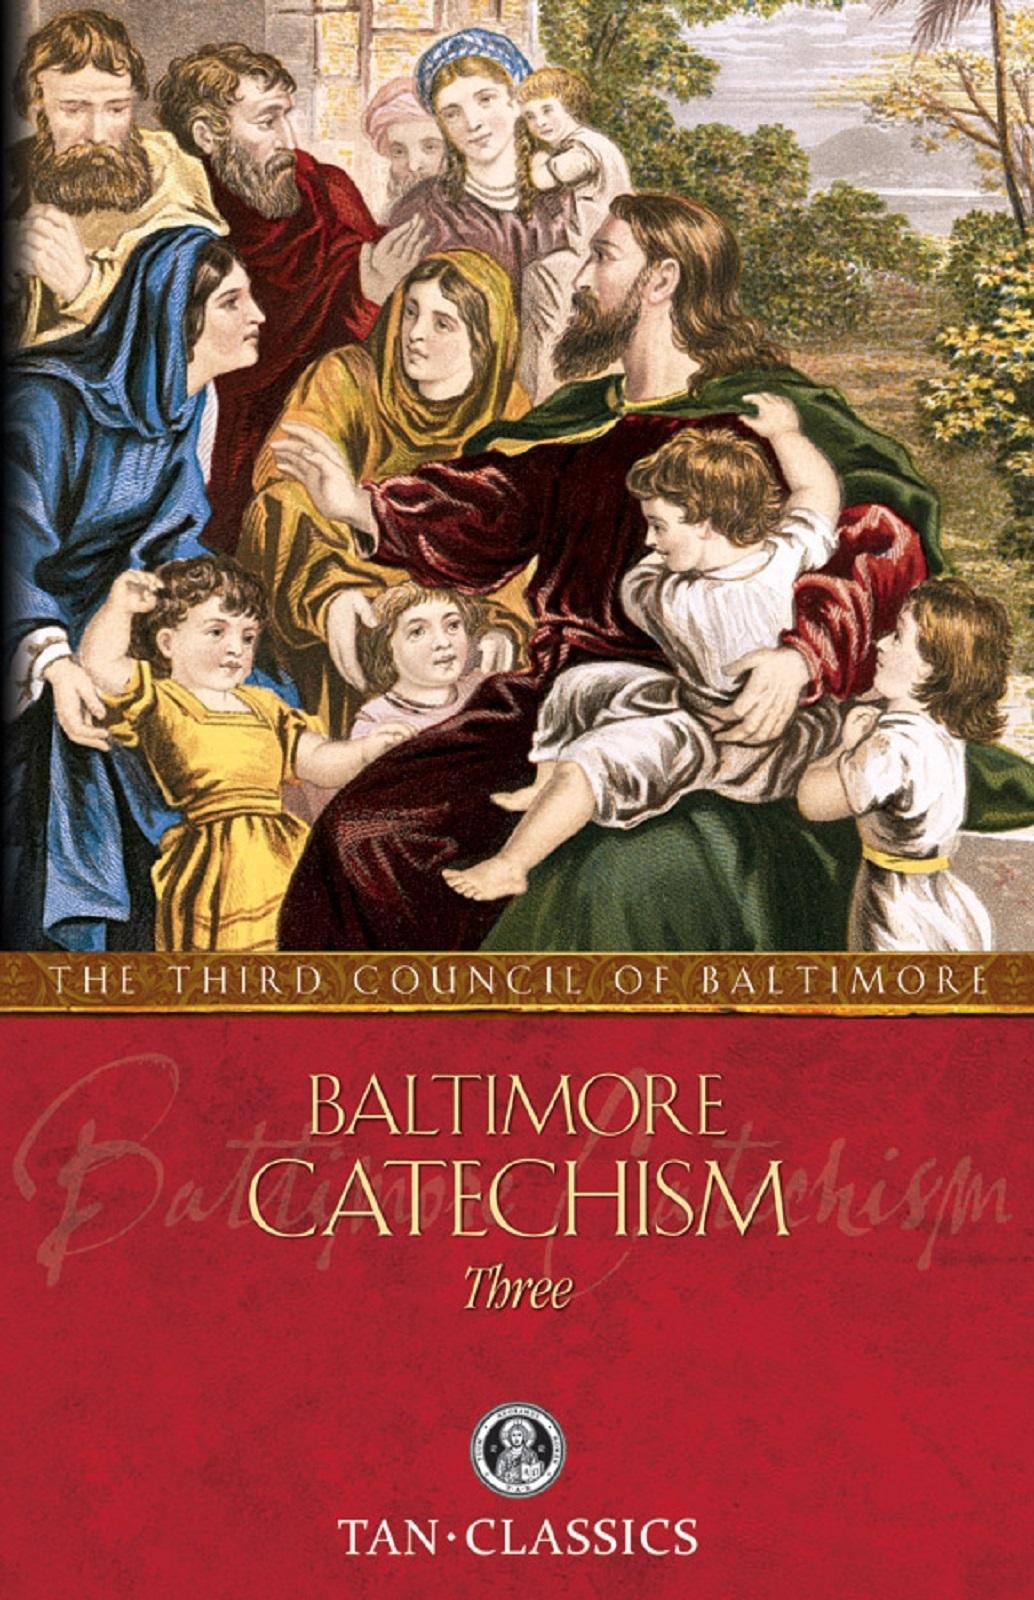 Baltimore catechism 3tc0147x